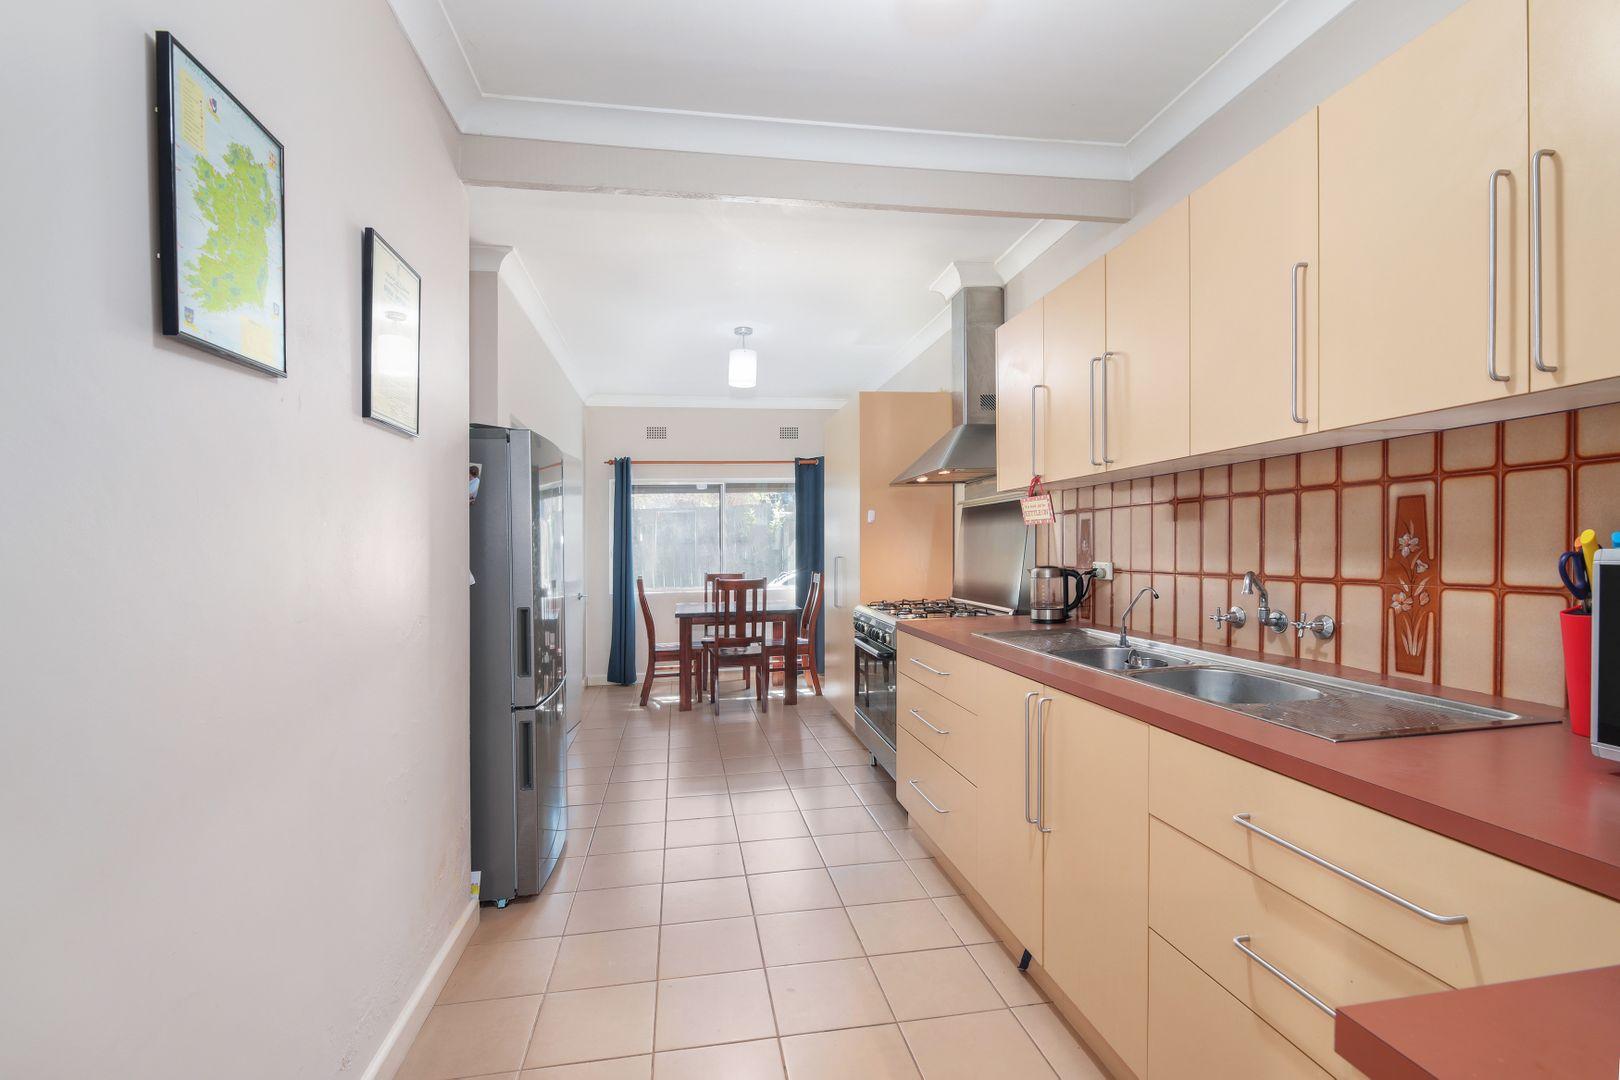 22-24 Bayswater Street, Drummoyne NSW 2047, Image 2